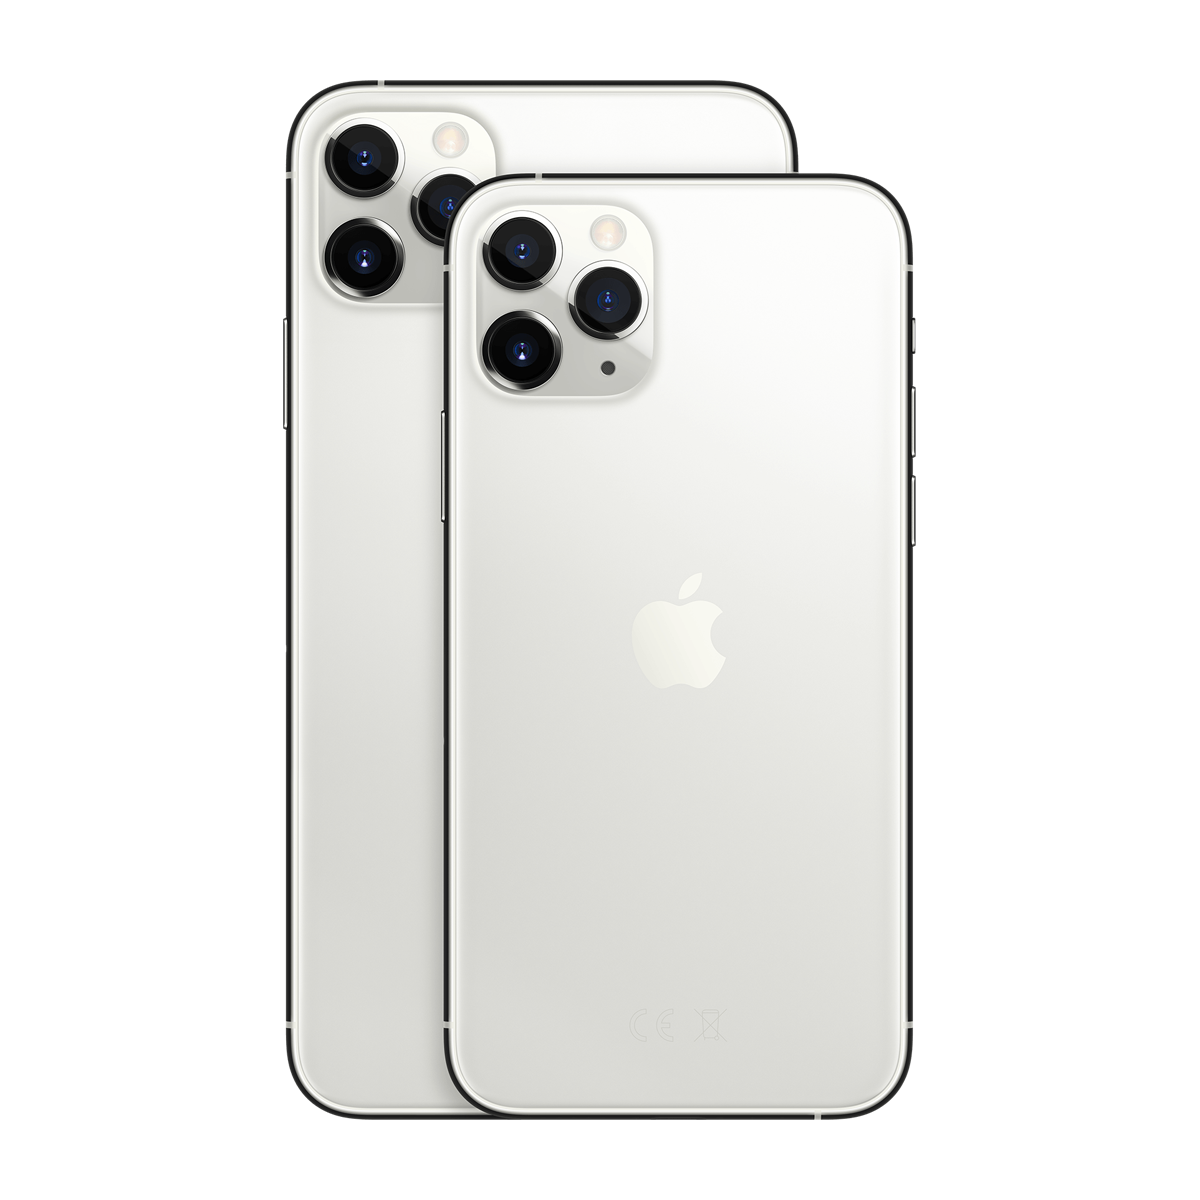 Apple iPhone 11 Pro Max 64 GB Silver